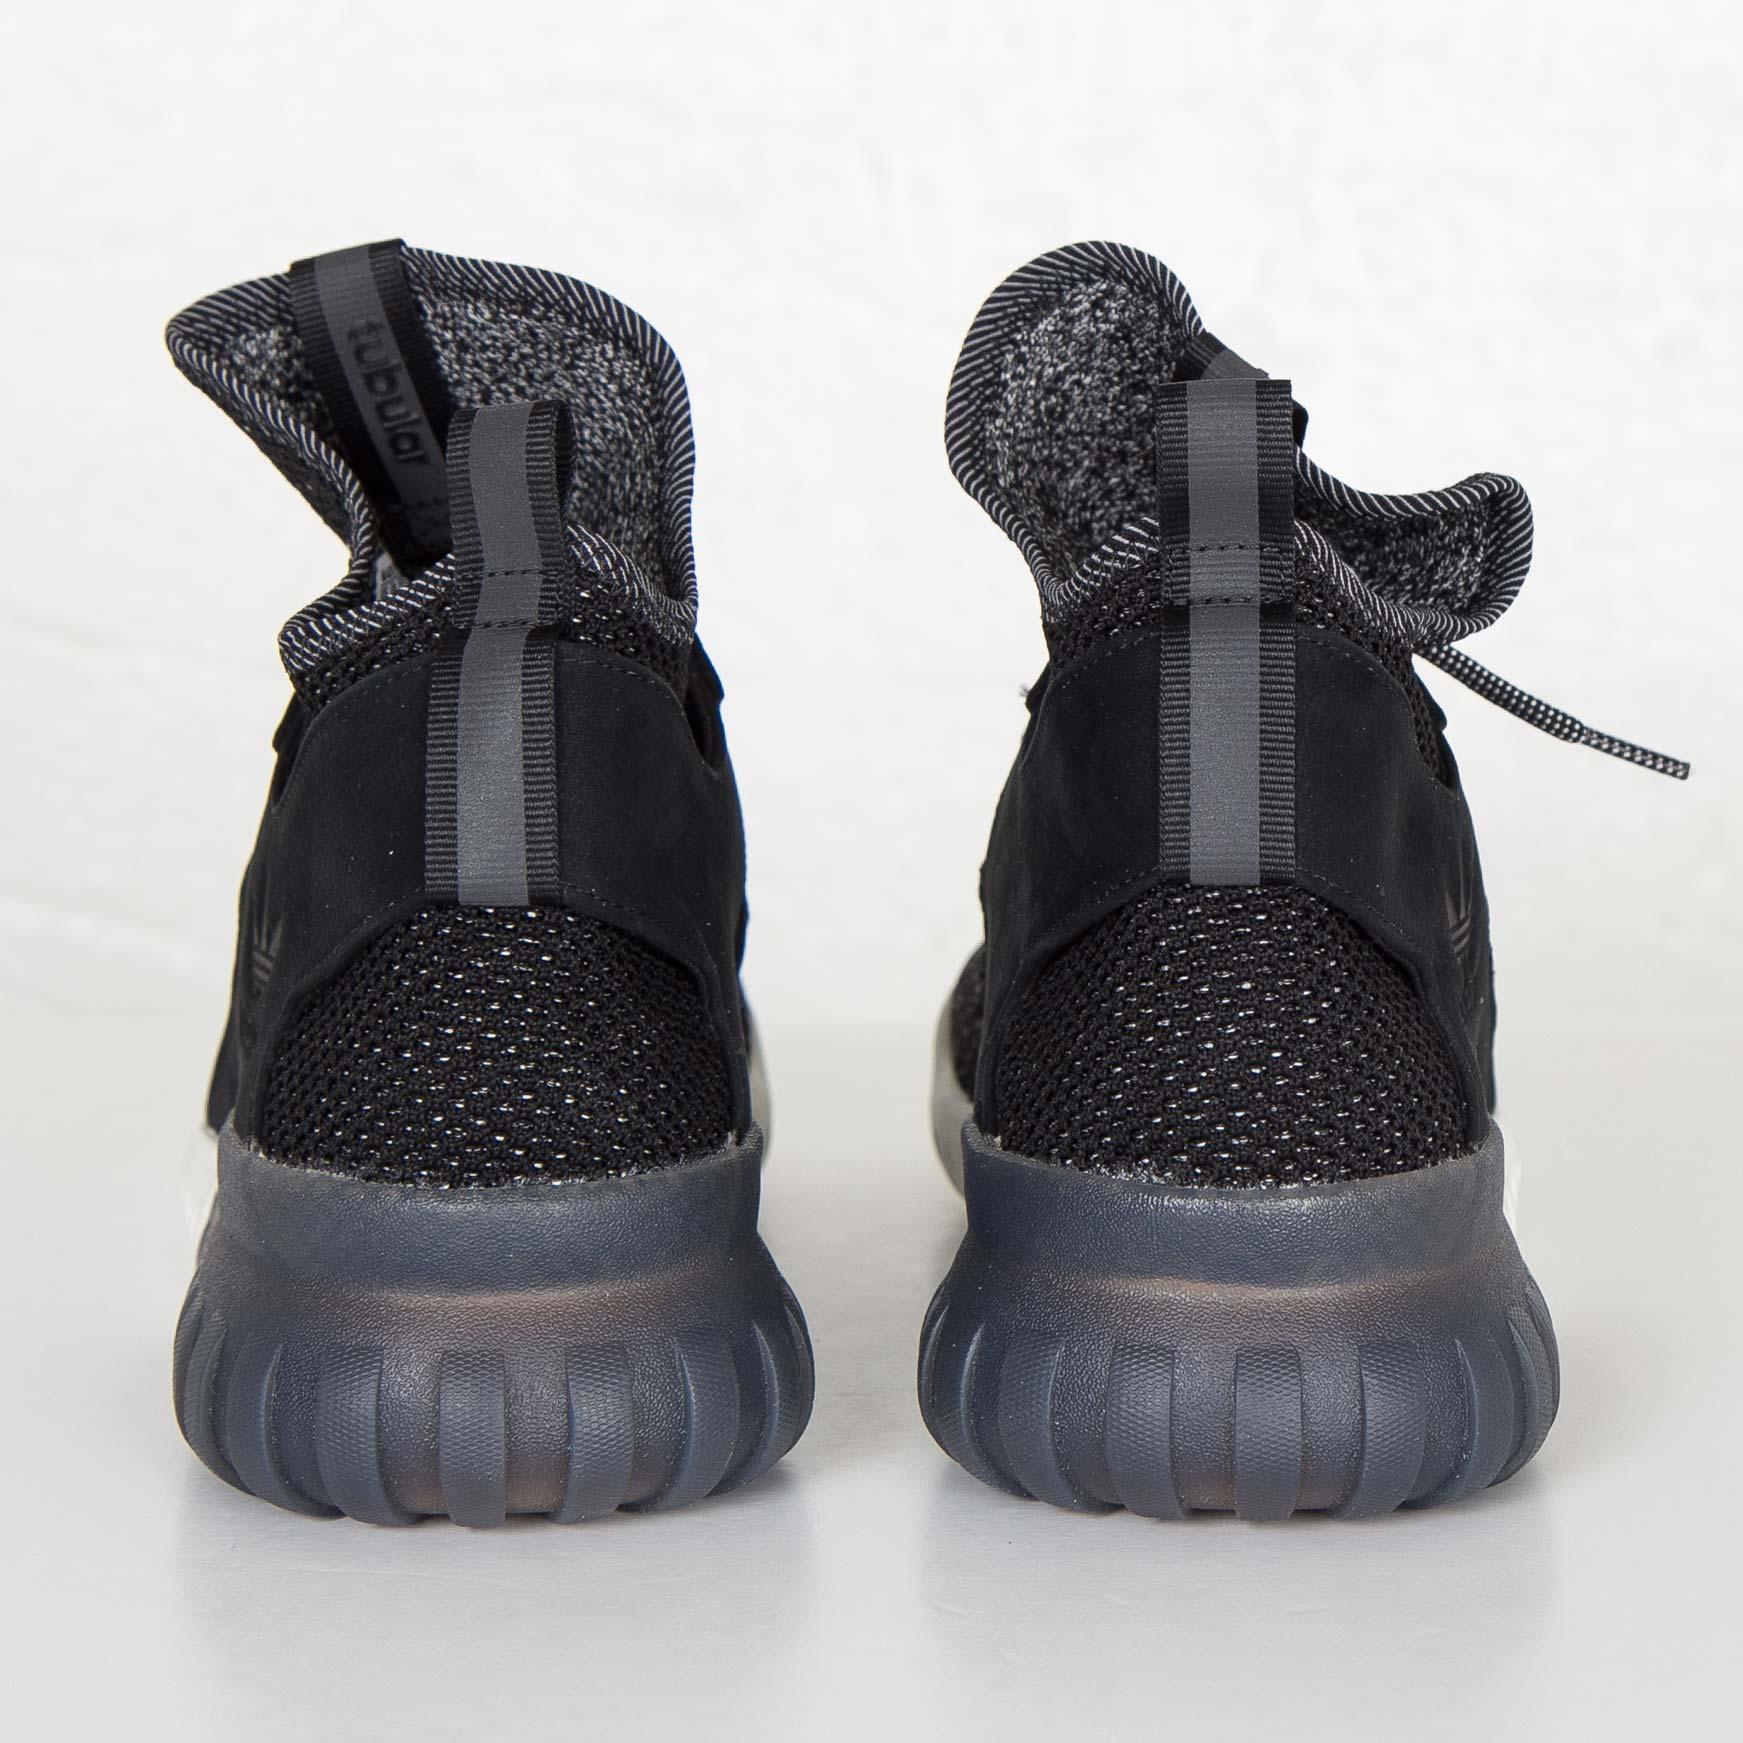 save off 1a909 04172 adidas Tubular x ASW Primeknit - S74933 - Sneakersnstuff   sneakers    streetwear online since 1999